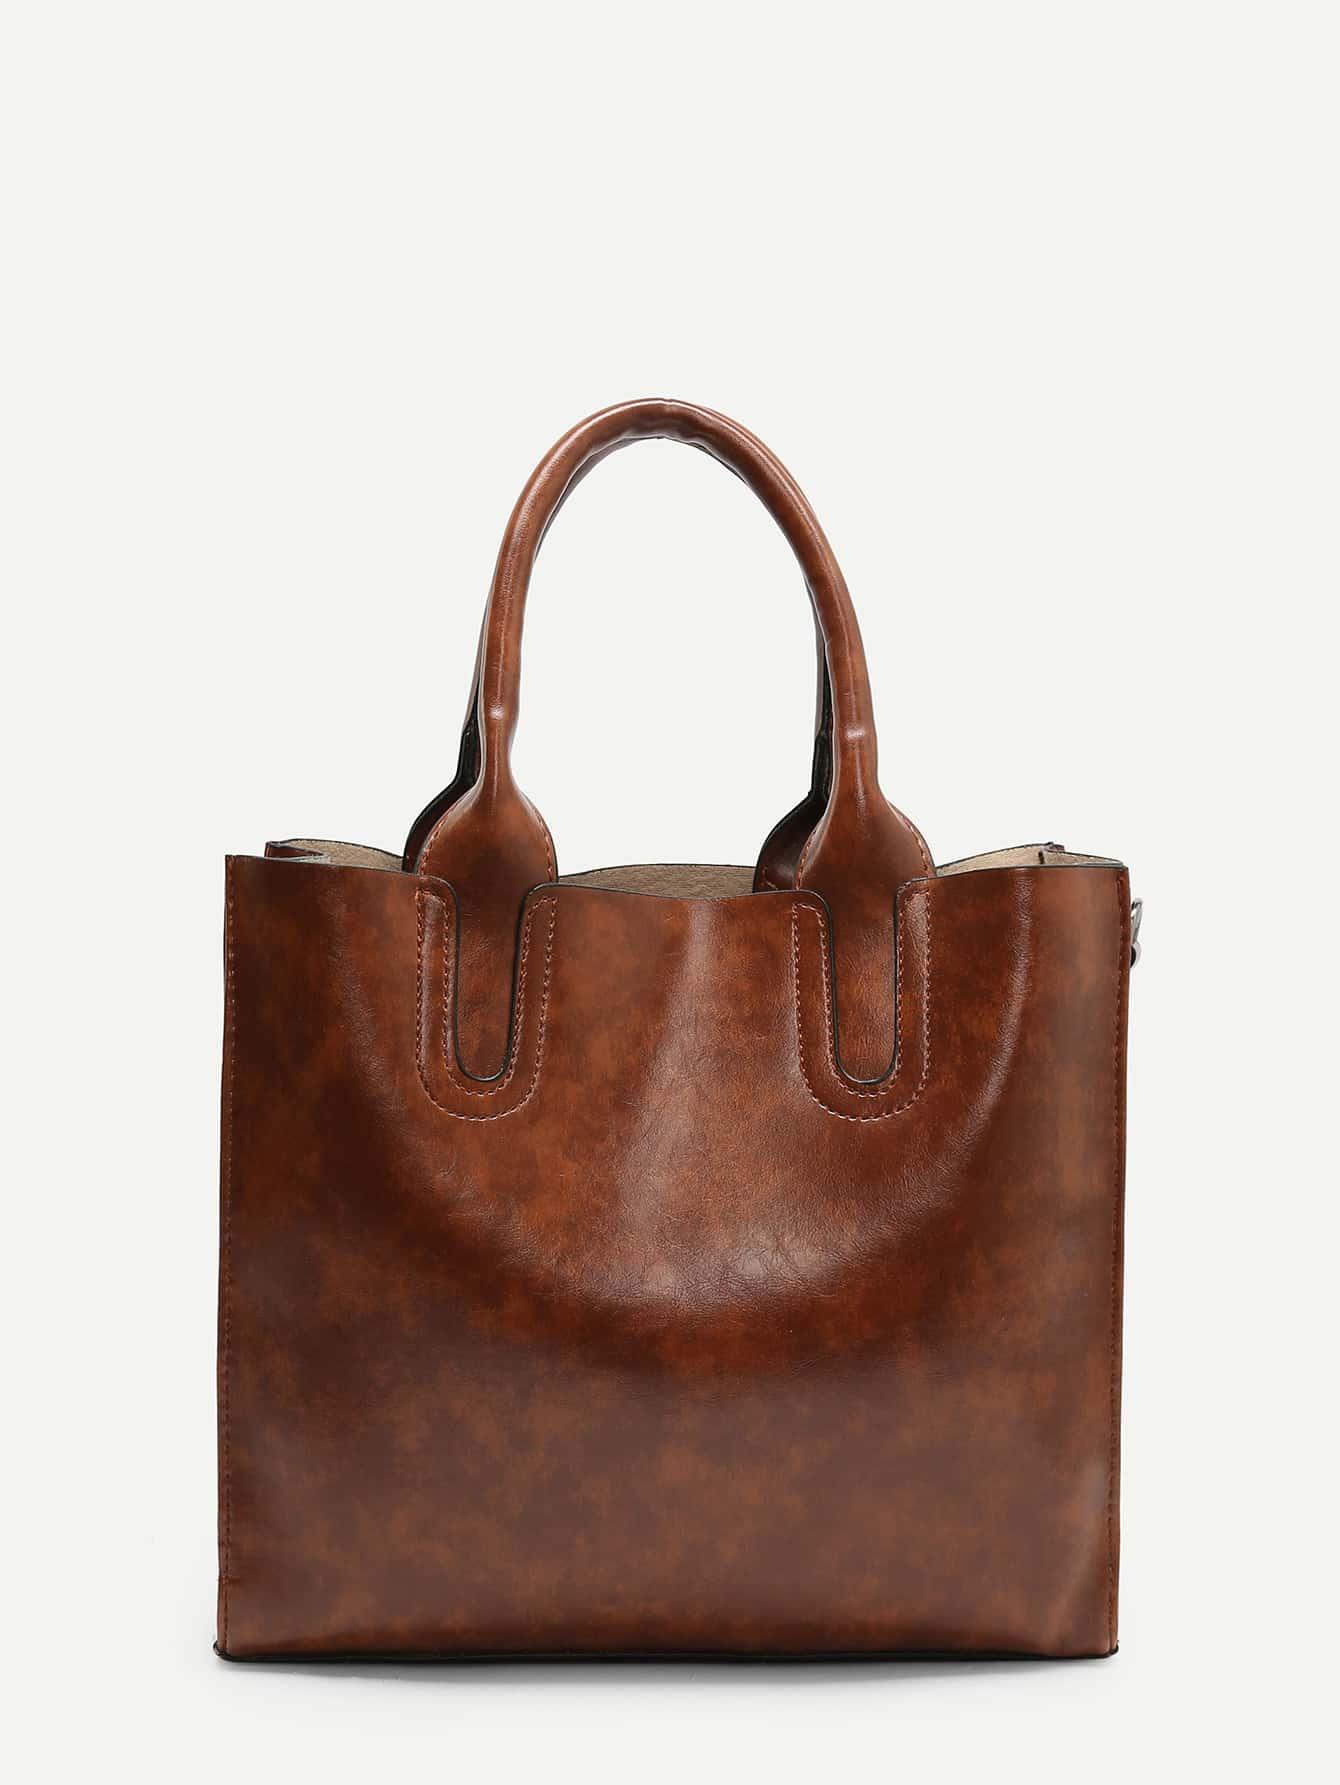 3 Pcs Work Style Handbag Sets